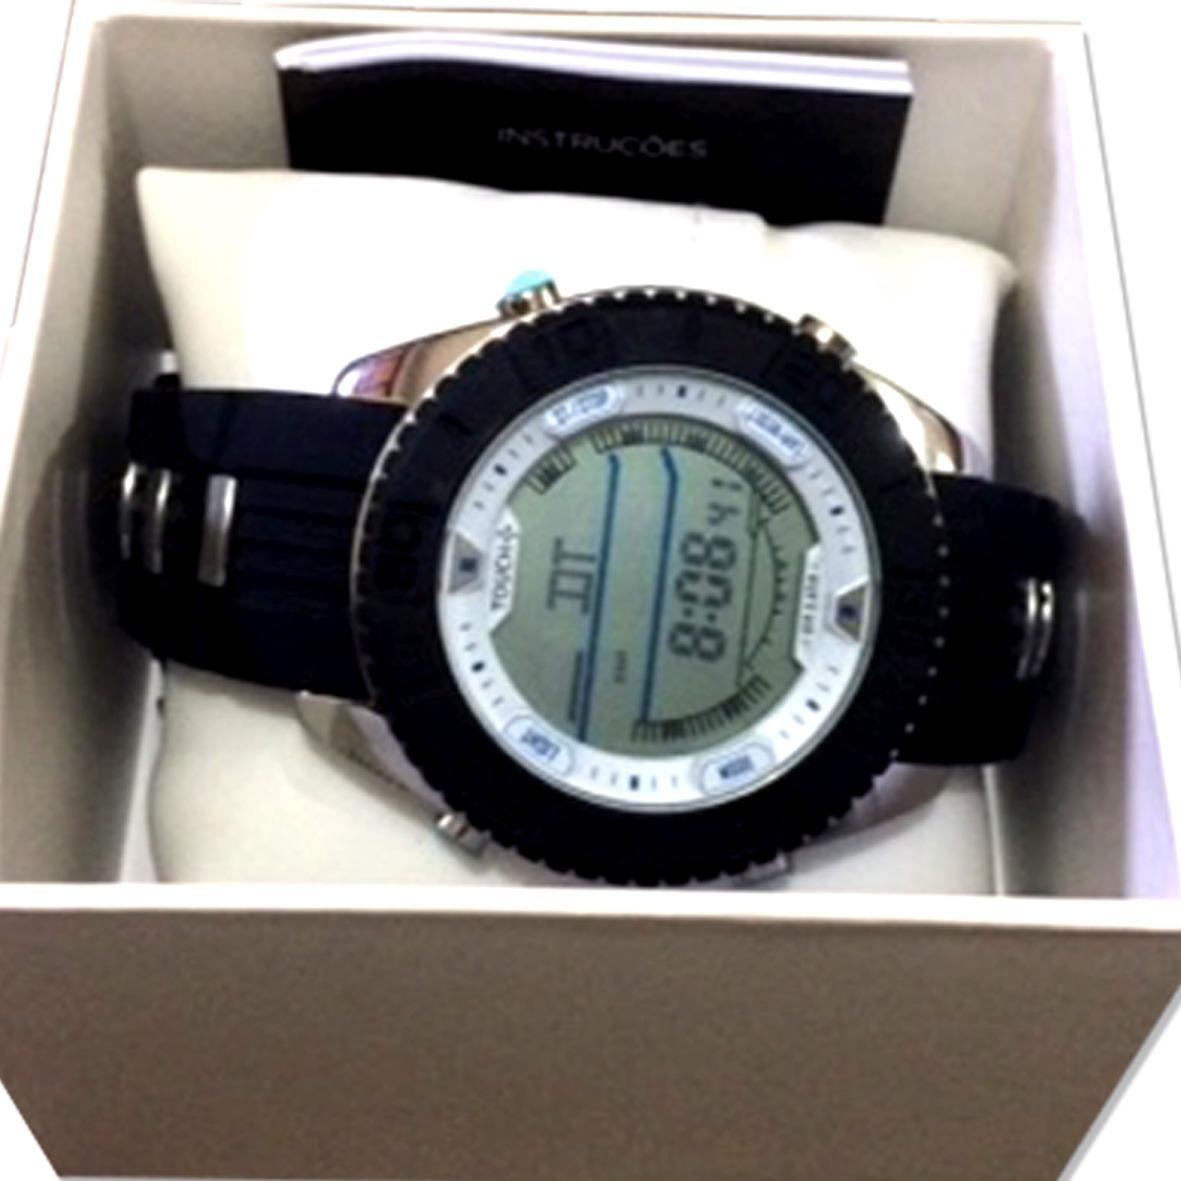 76d1811edd1 Relógio Digital Touchwatches - Grupotechnos - R  49